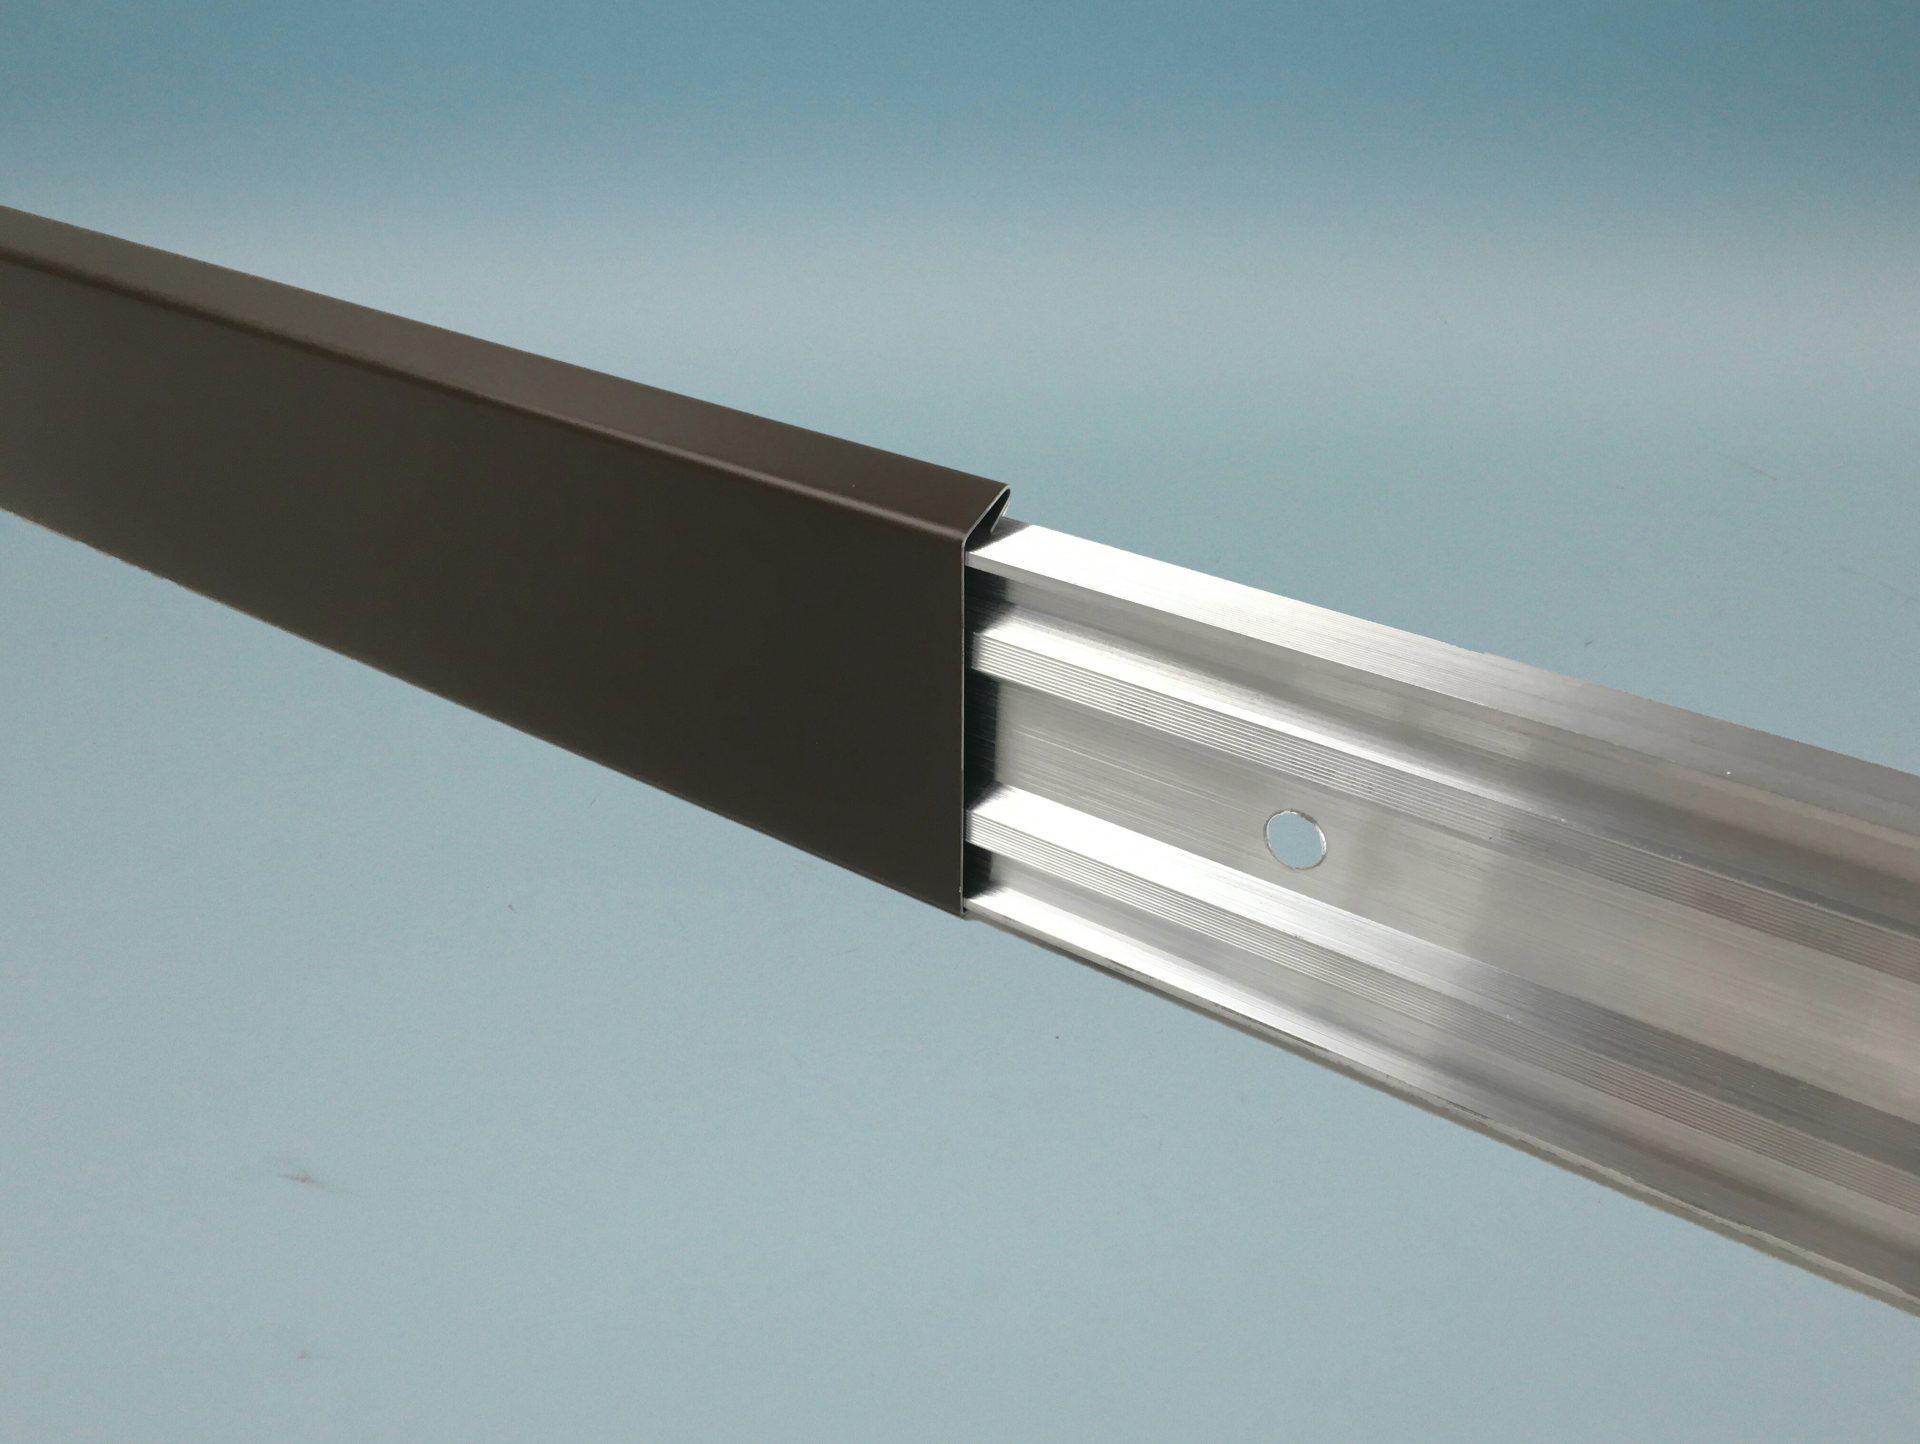 Wandanschlussprofil Aluminium stranggepresst - Kappleiste